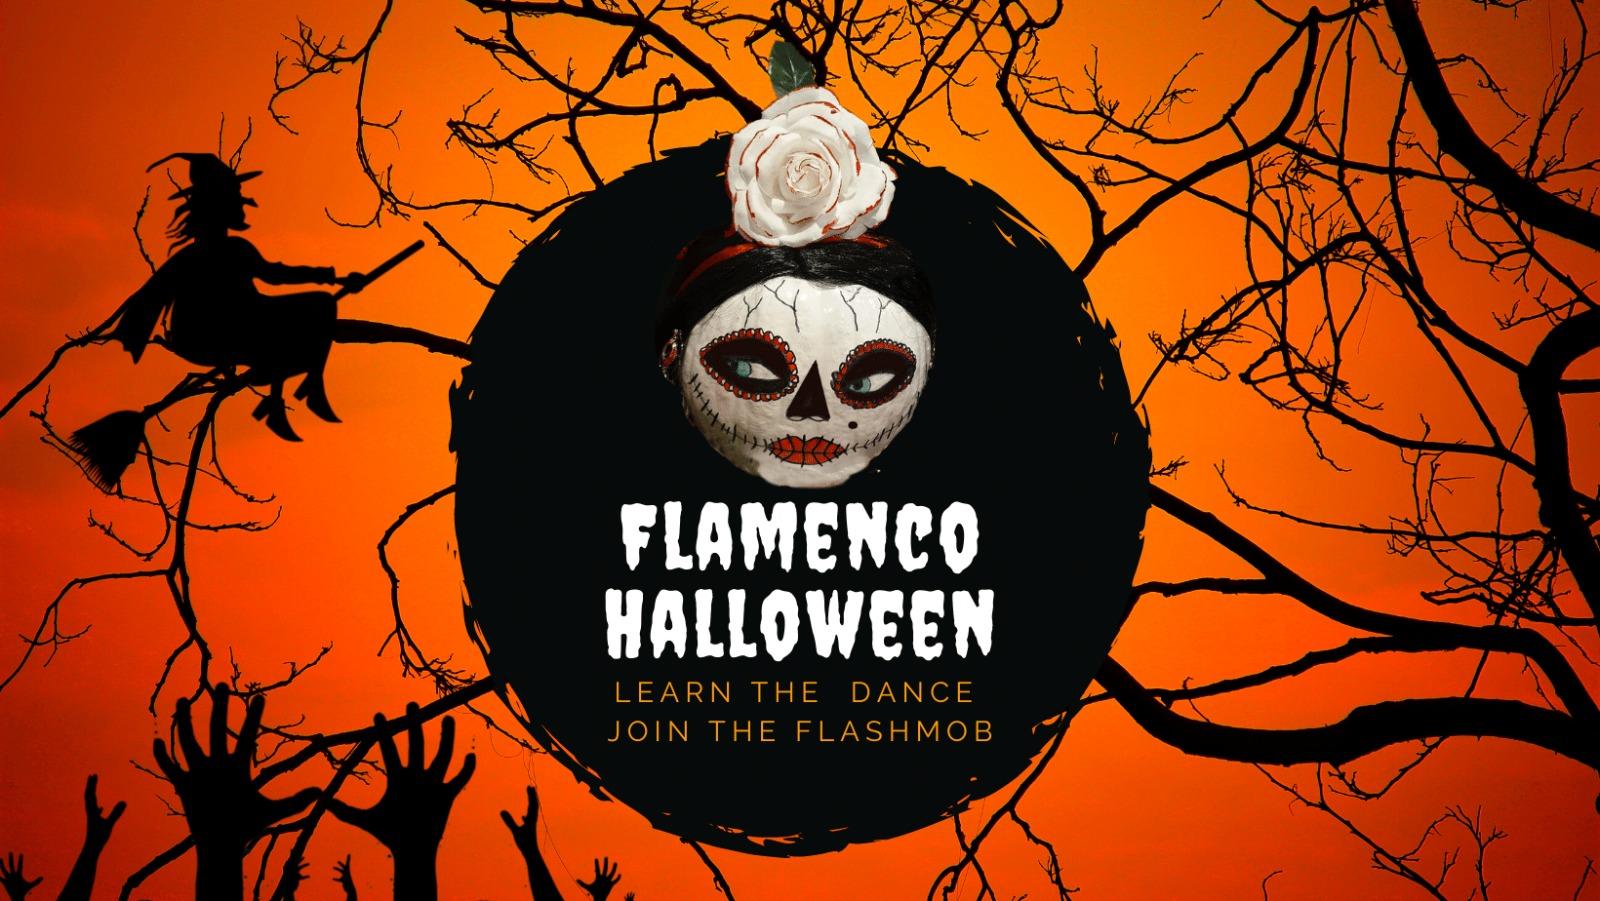 Flamenco Halloween